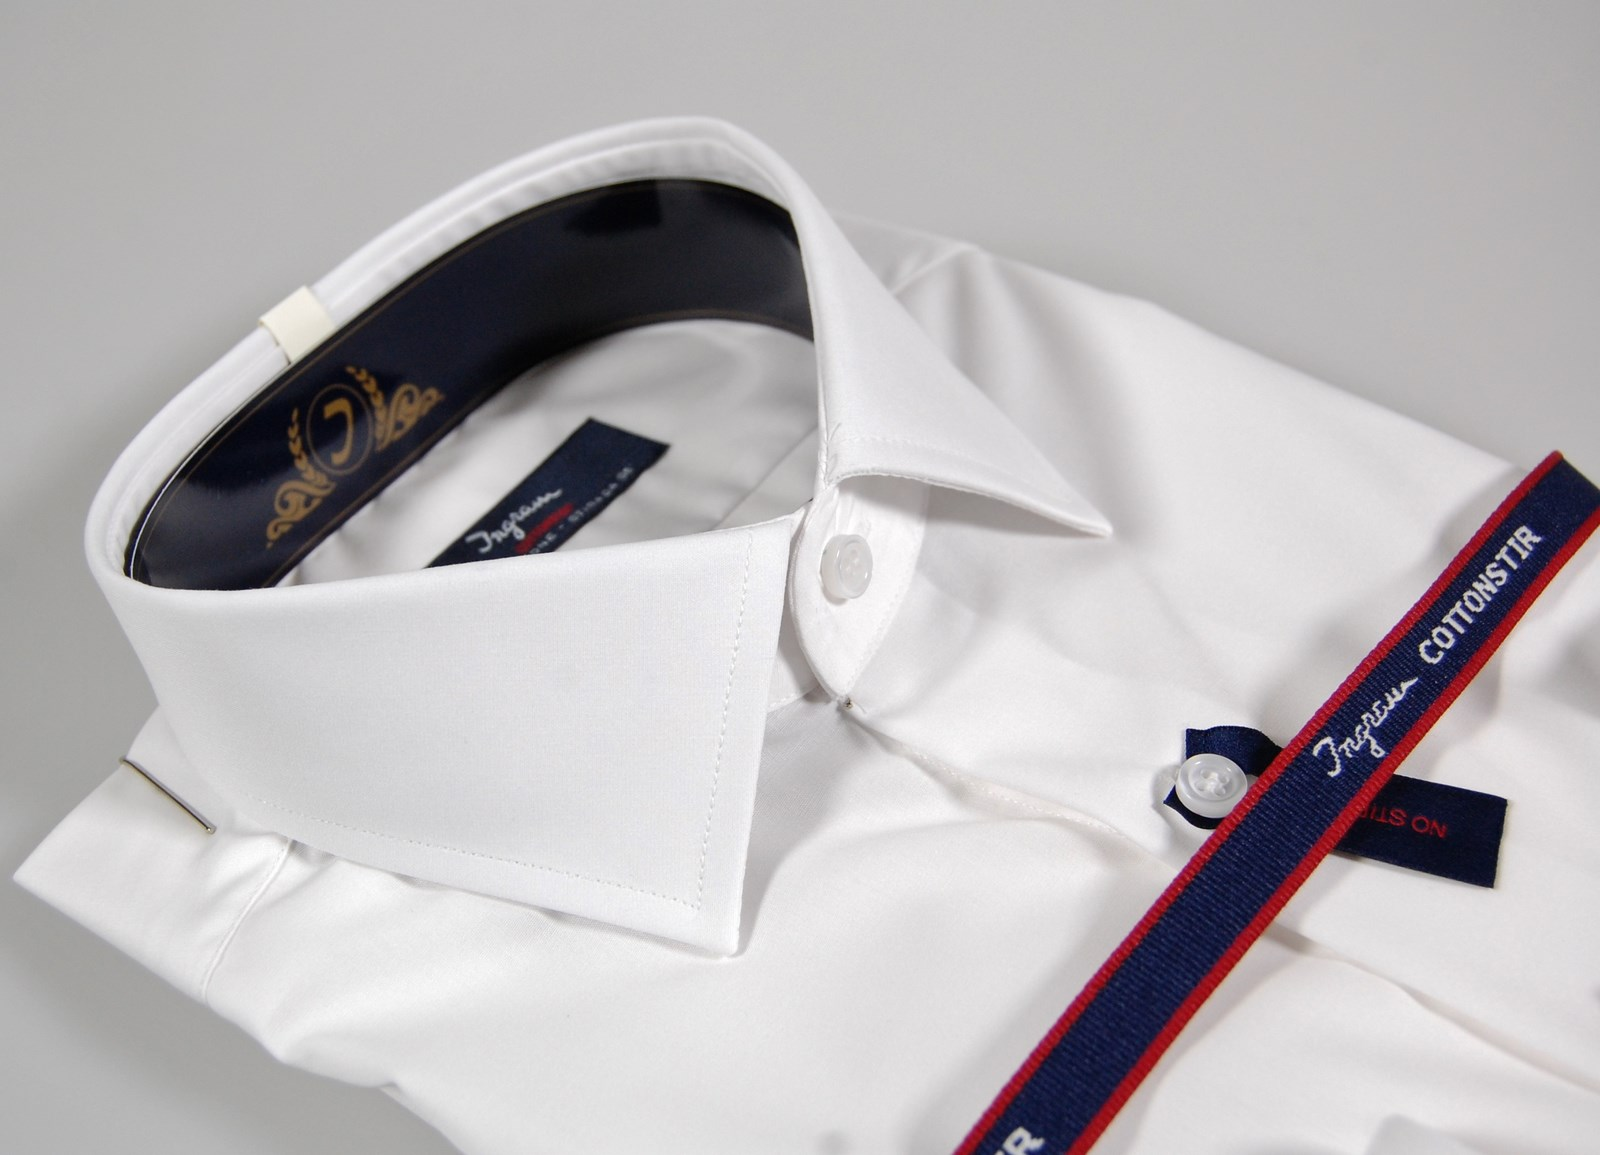 b4c74f78ff Dettagli su Camicia Ingram CottonStir bianca Slim Fit collo francese cotone  No Stiro TG 37